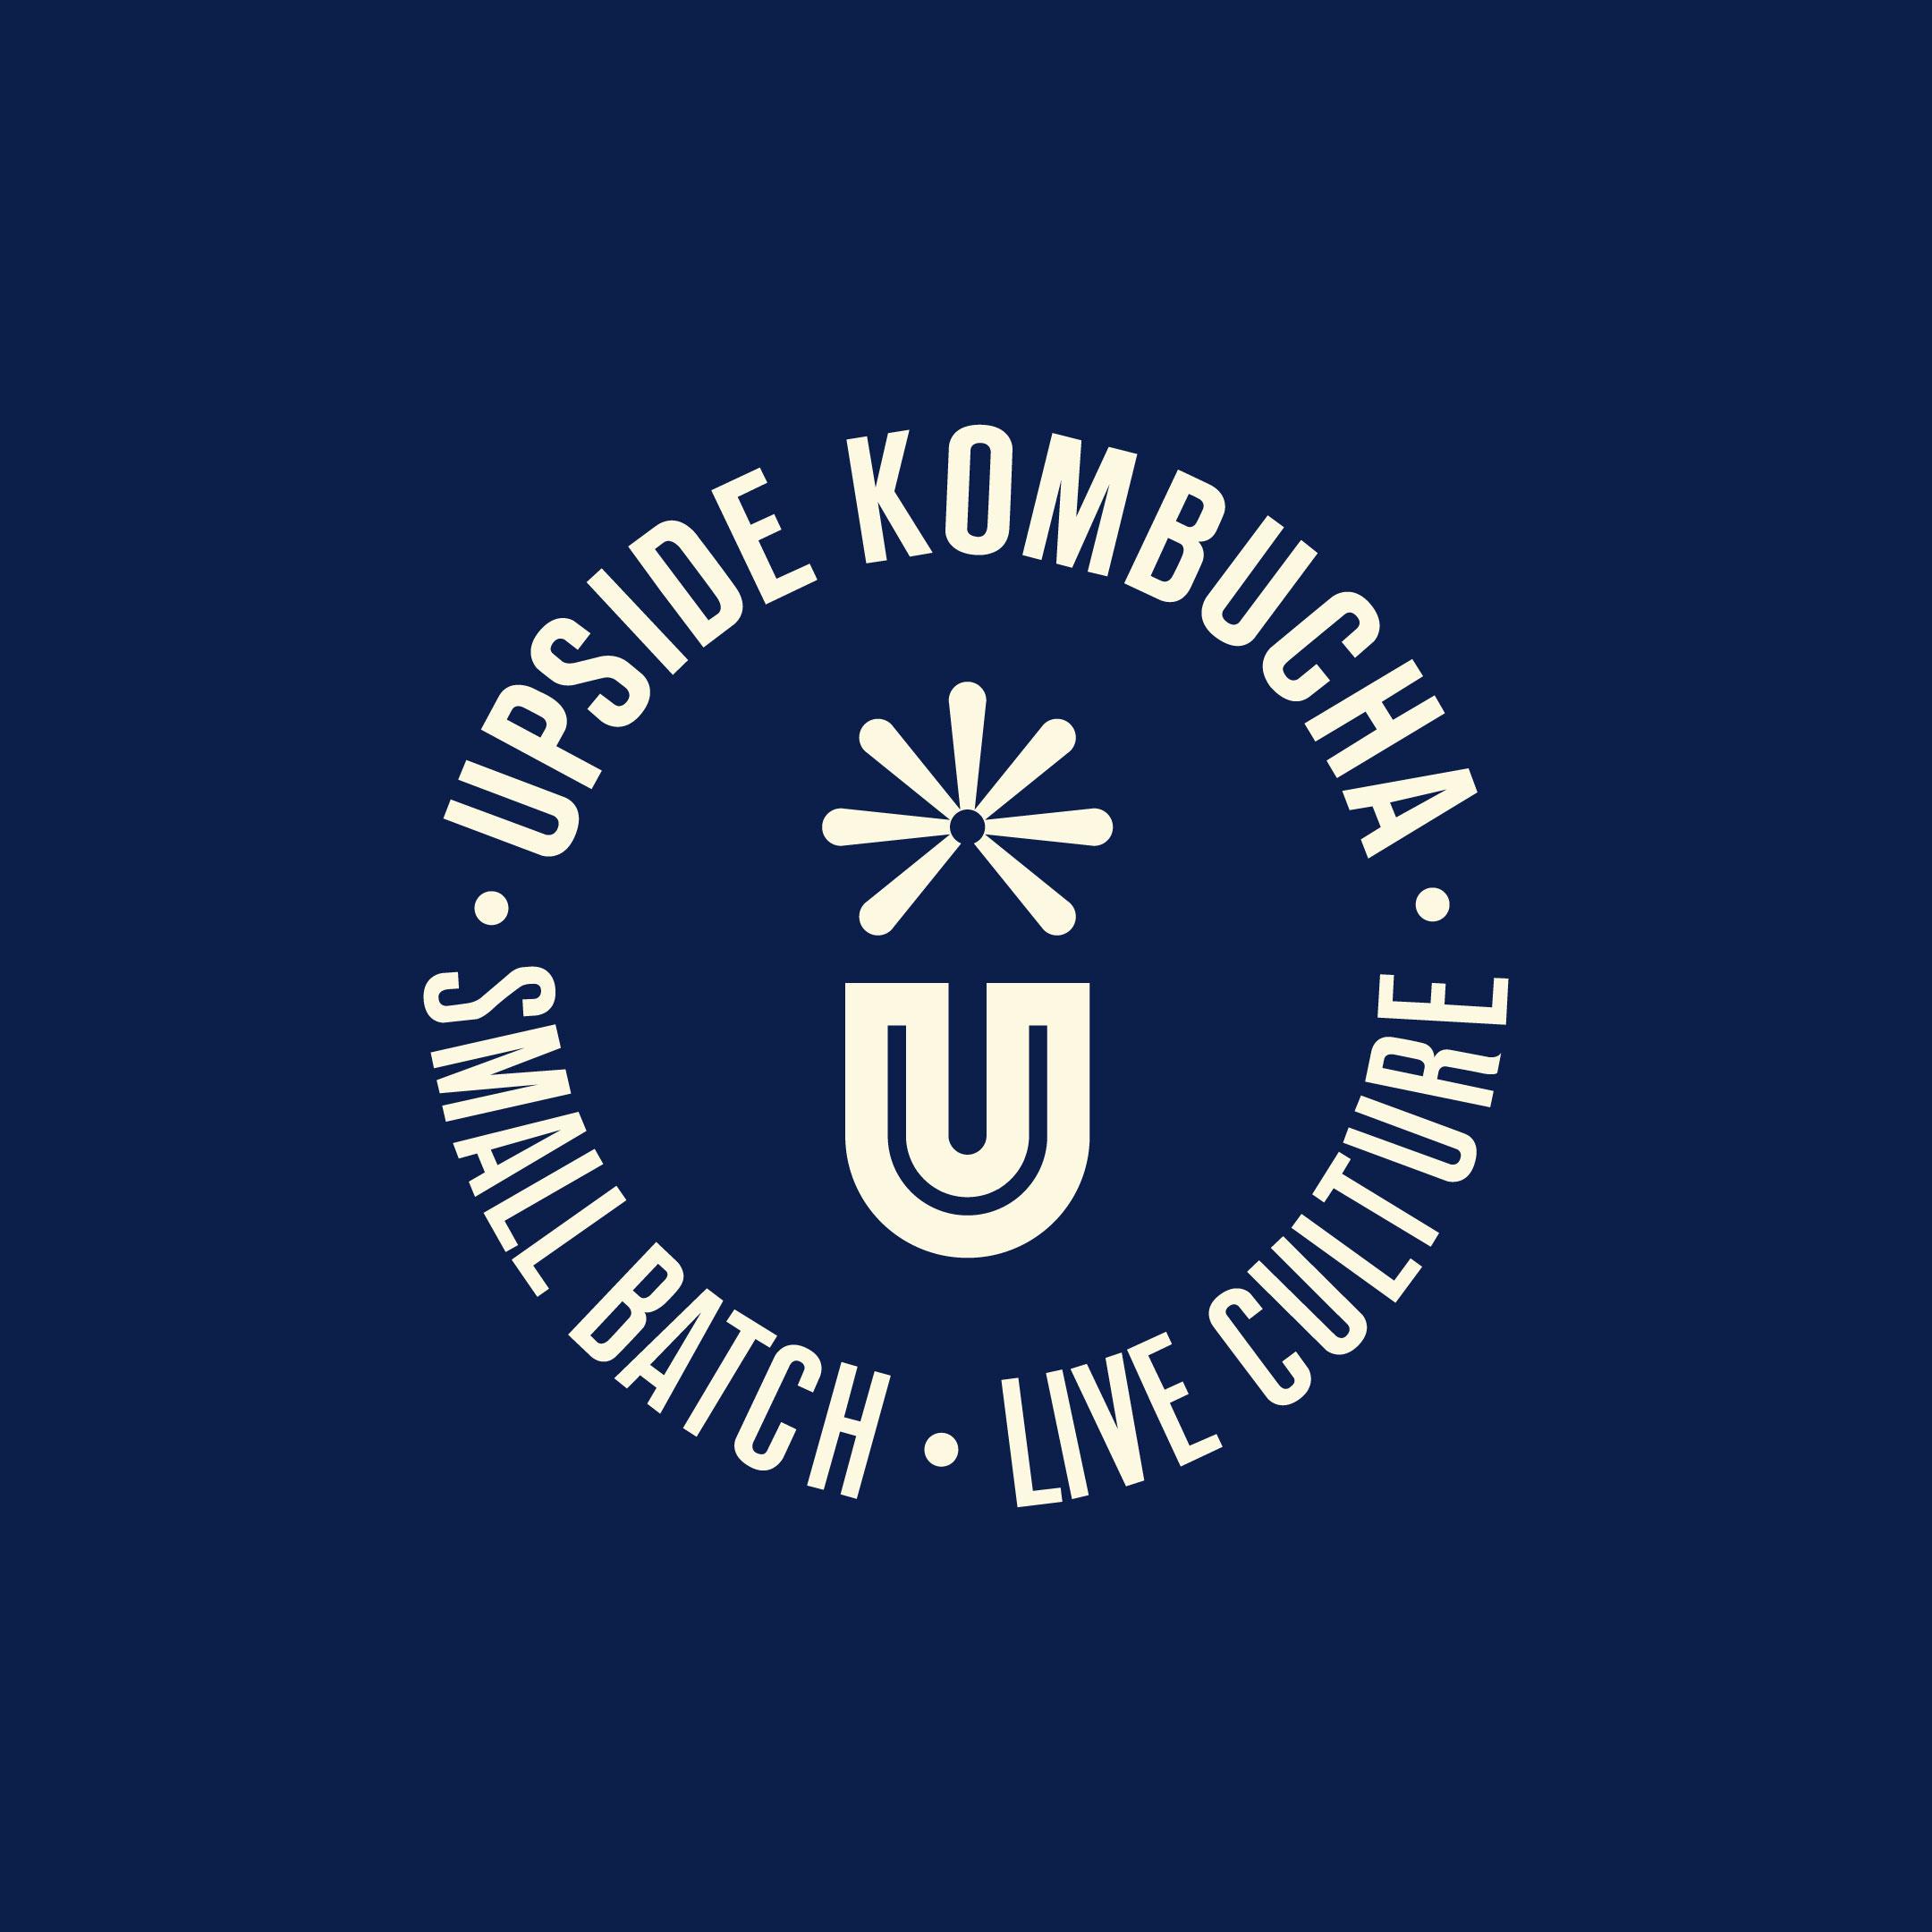 Upside_logo1.jpg